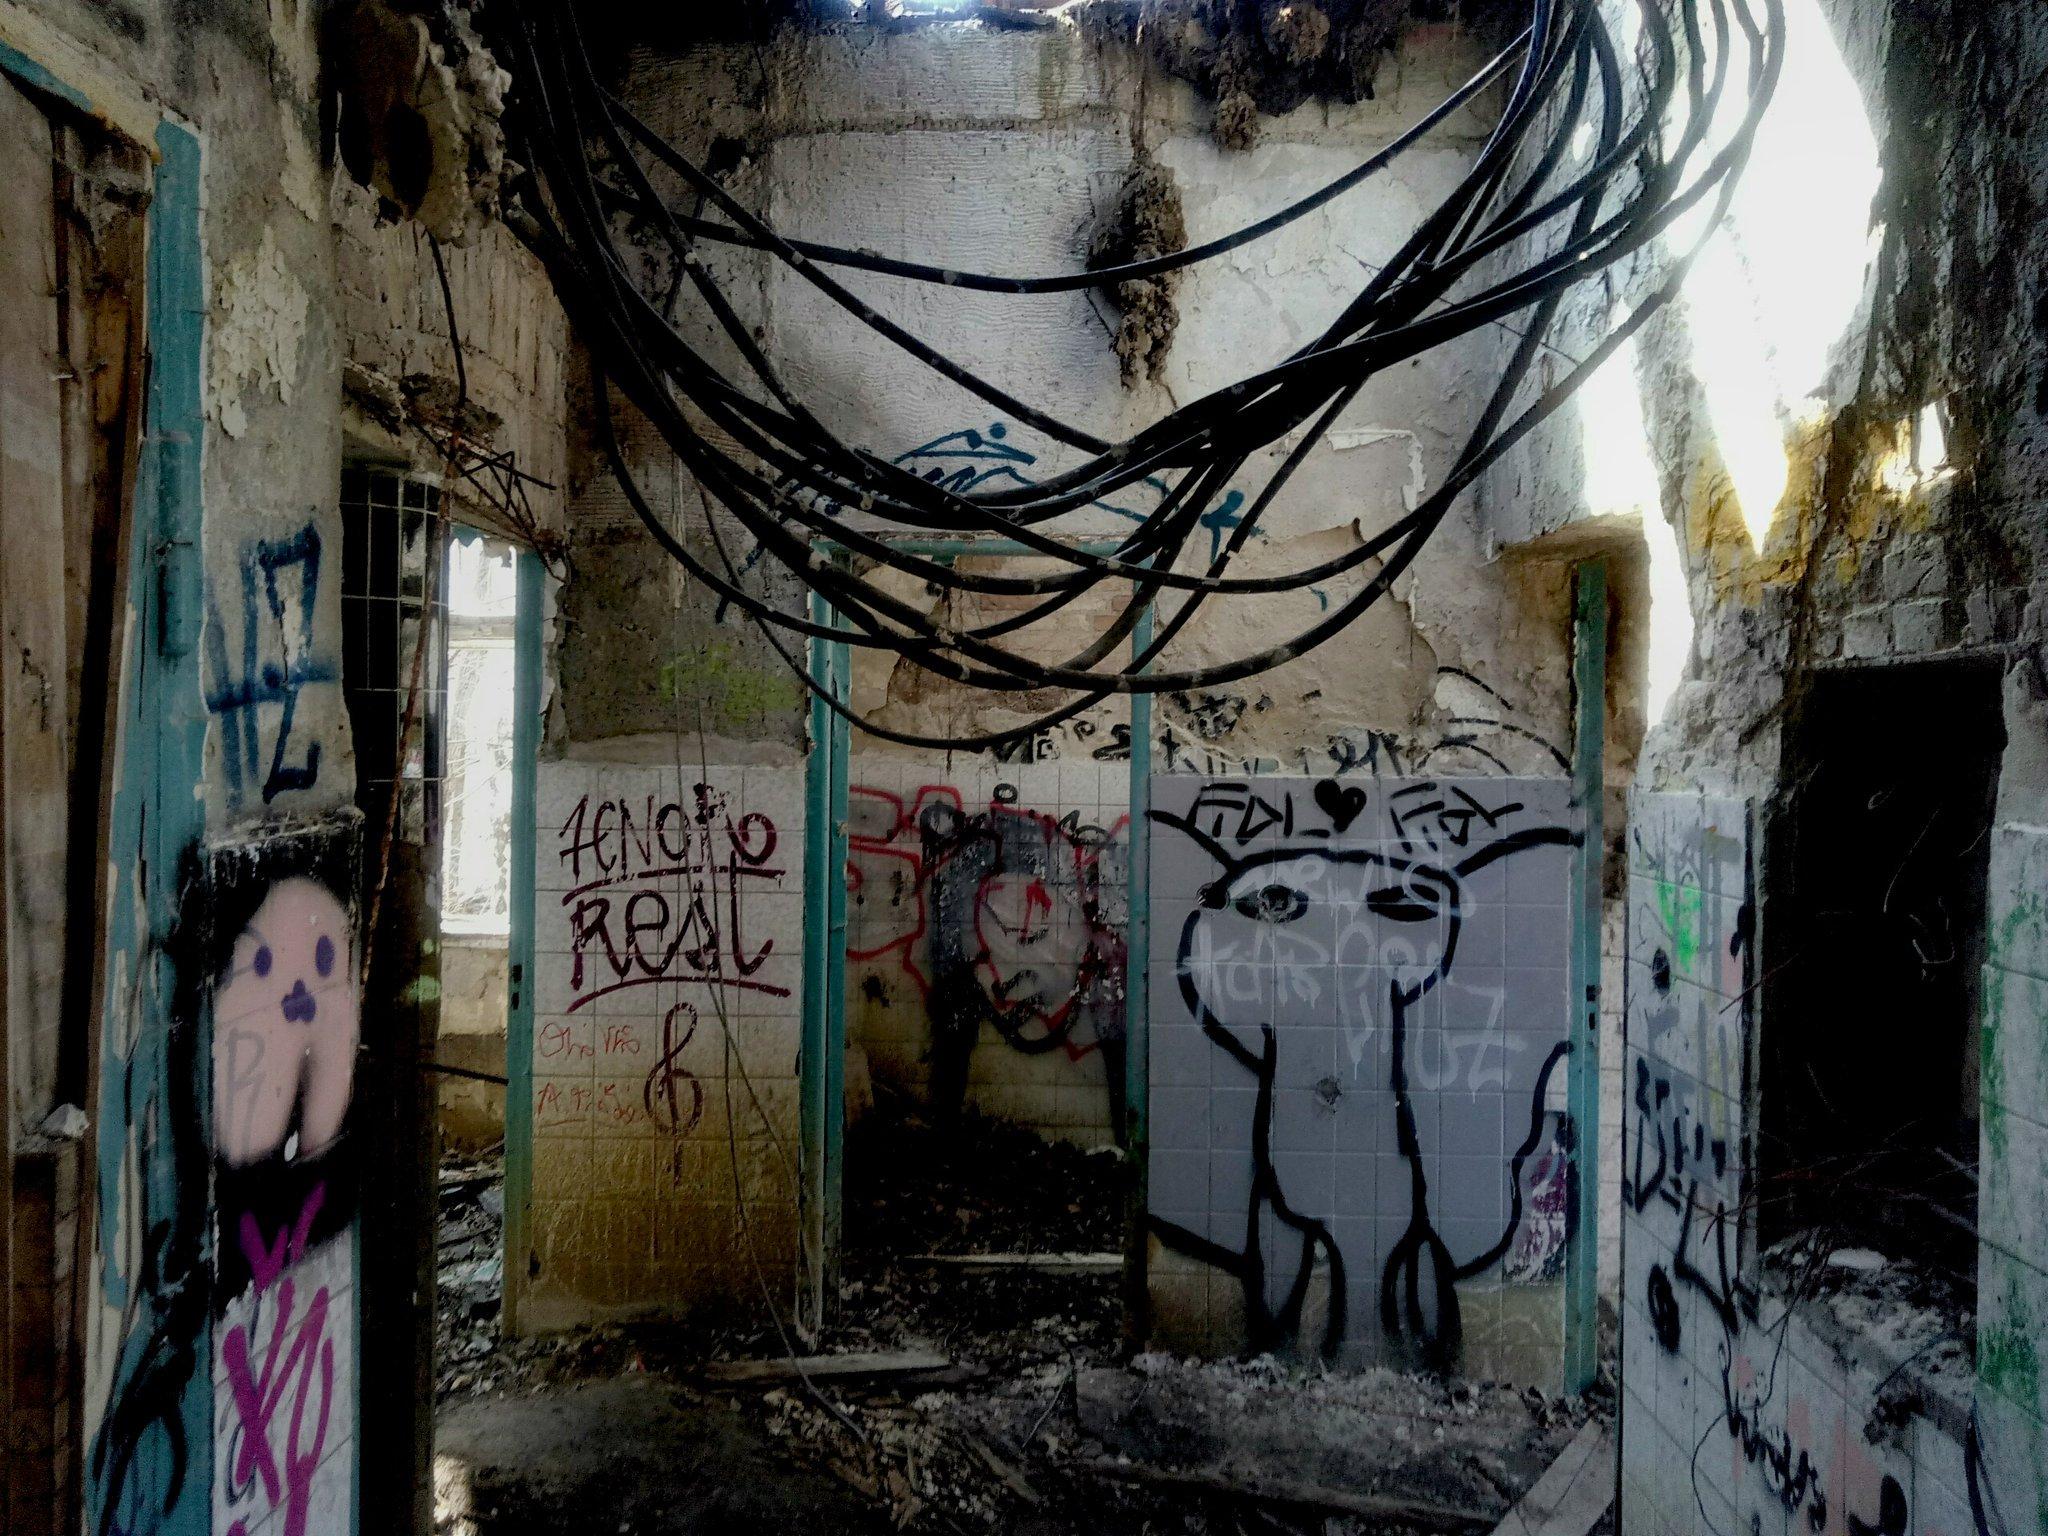 ospedale fantasma 4